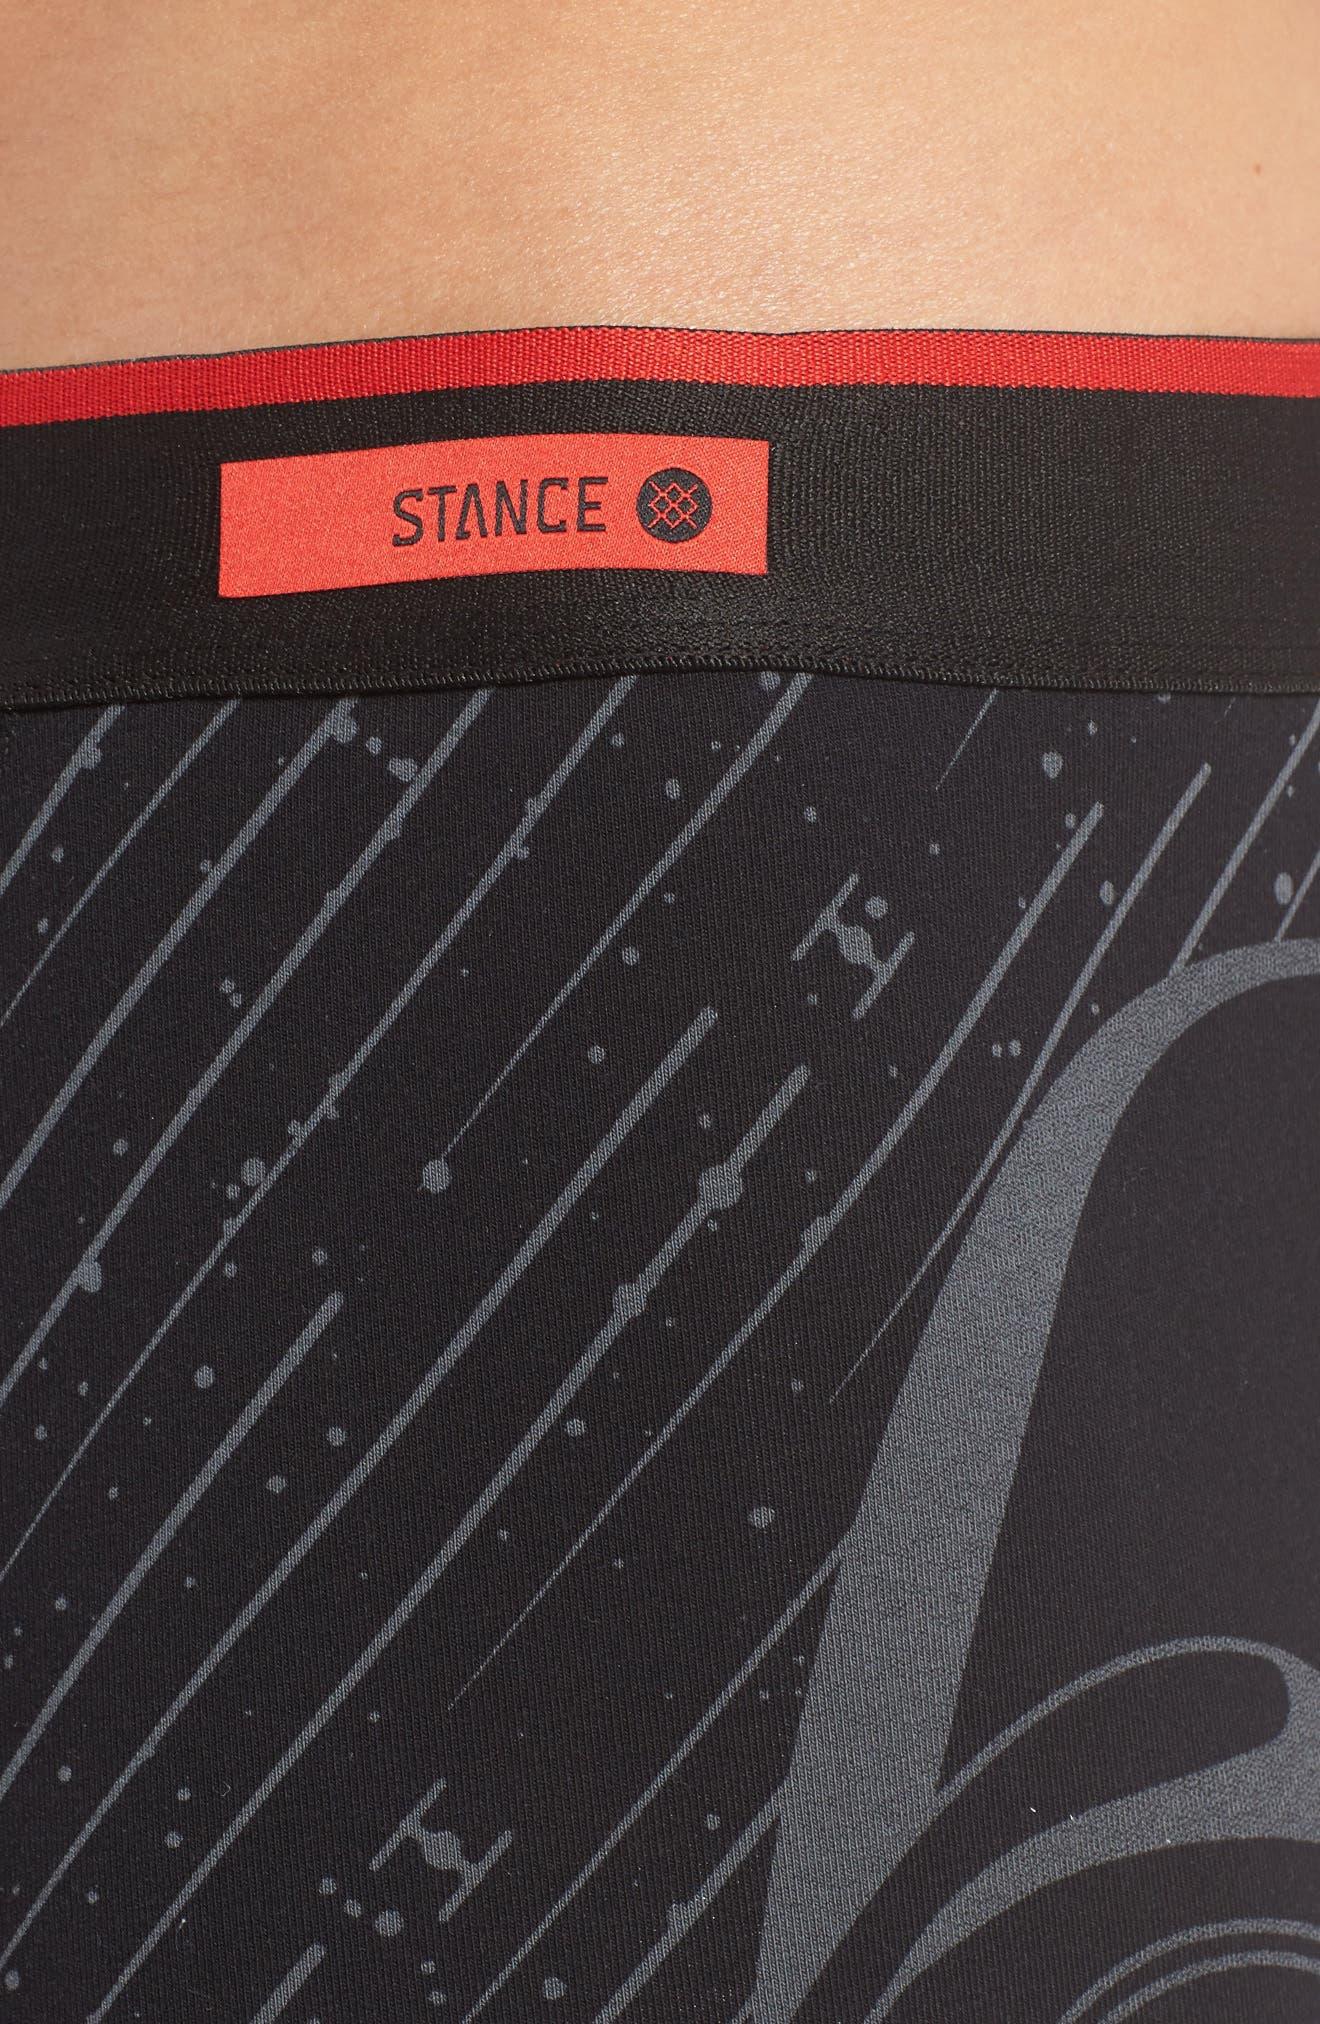 Del Mar Star Wars<sup>™</sup> Darth Vader Boxer Briefs,                             Alternate thumbnail 4, color,                             001